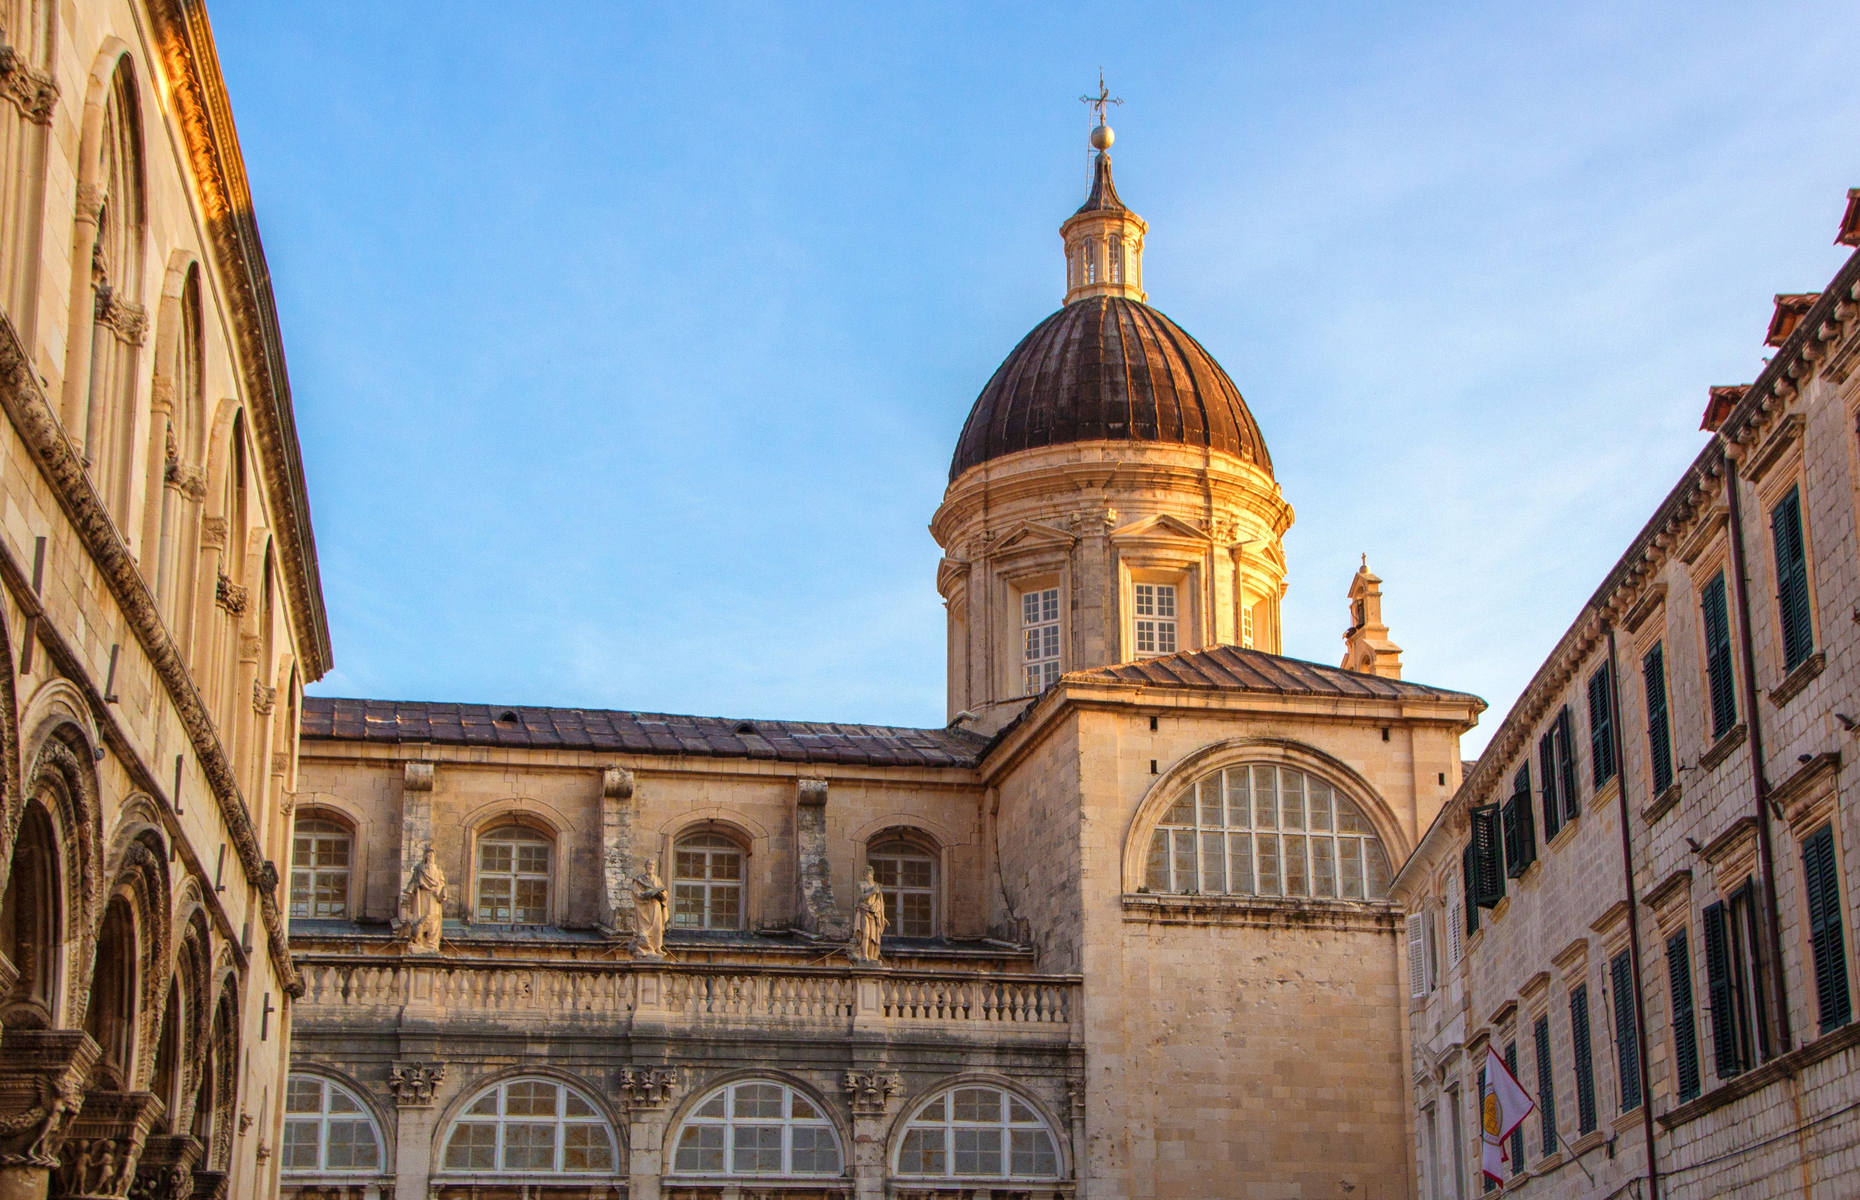 Rector's Palace in Dubrovnik (Image: Kireeva Veronika/Shutterstock)